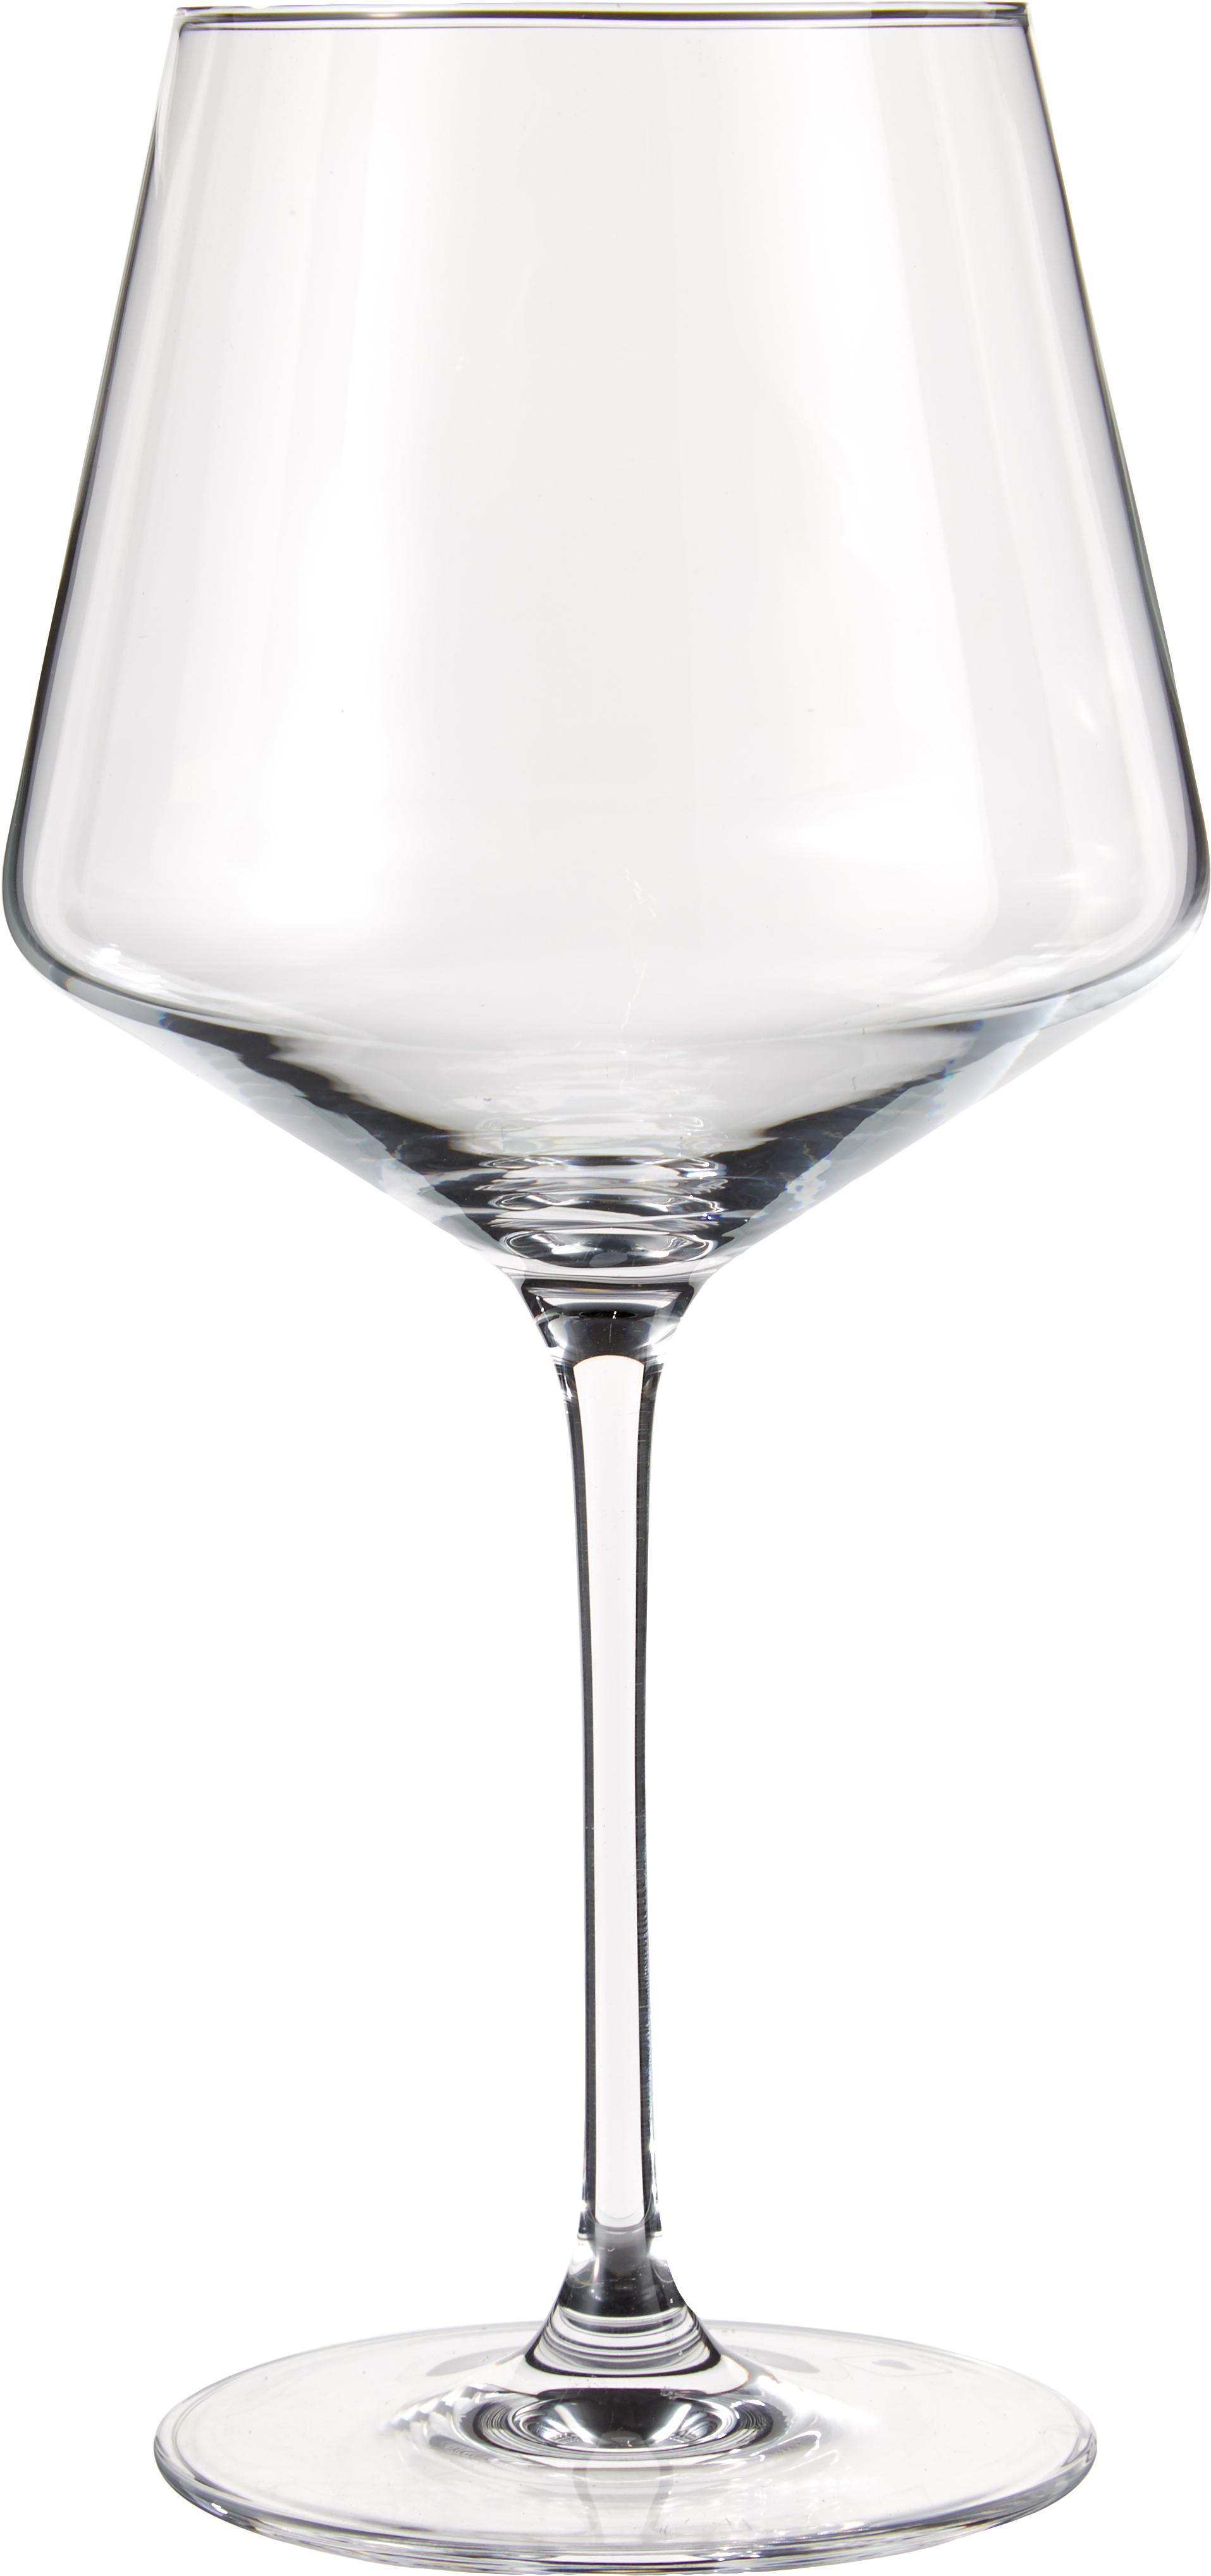 Bauchige Rotweingläser Burgunder Puccini, 6er-Set, Teqton®-Glas, Transparent, Ø 11 x H 23 cm